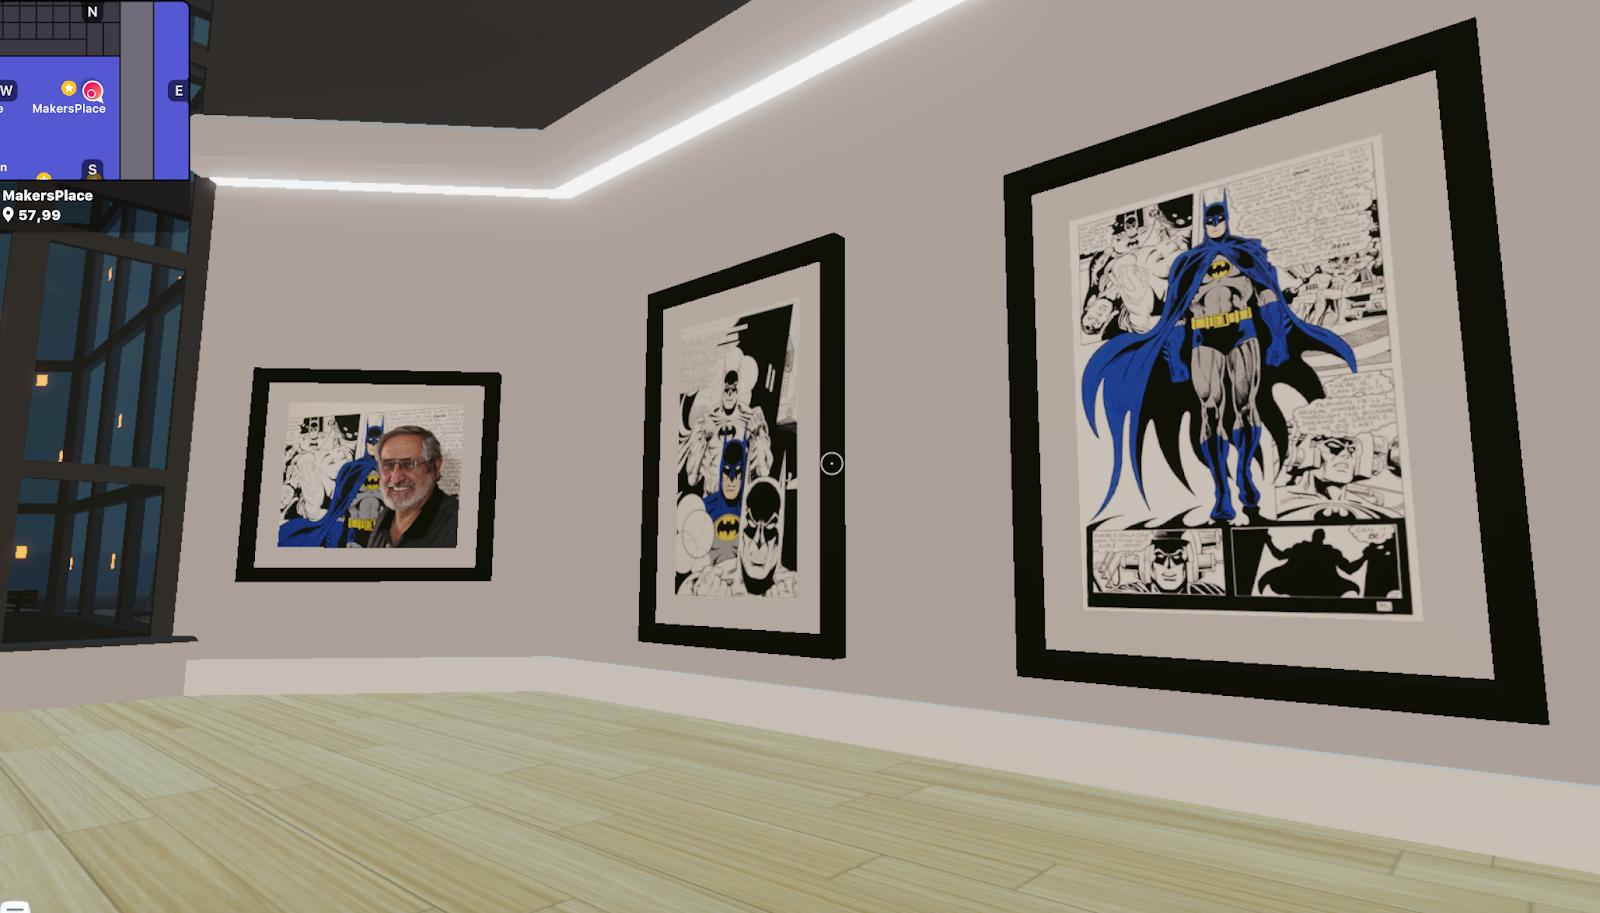 DC Comics Artist Launches VR Exhibition in Decentraland